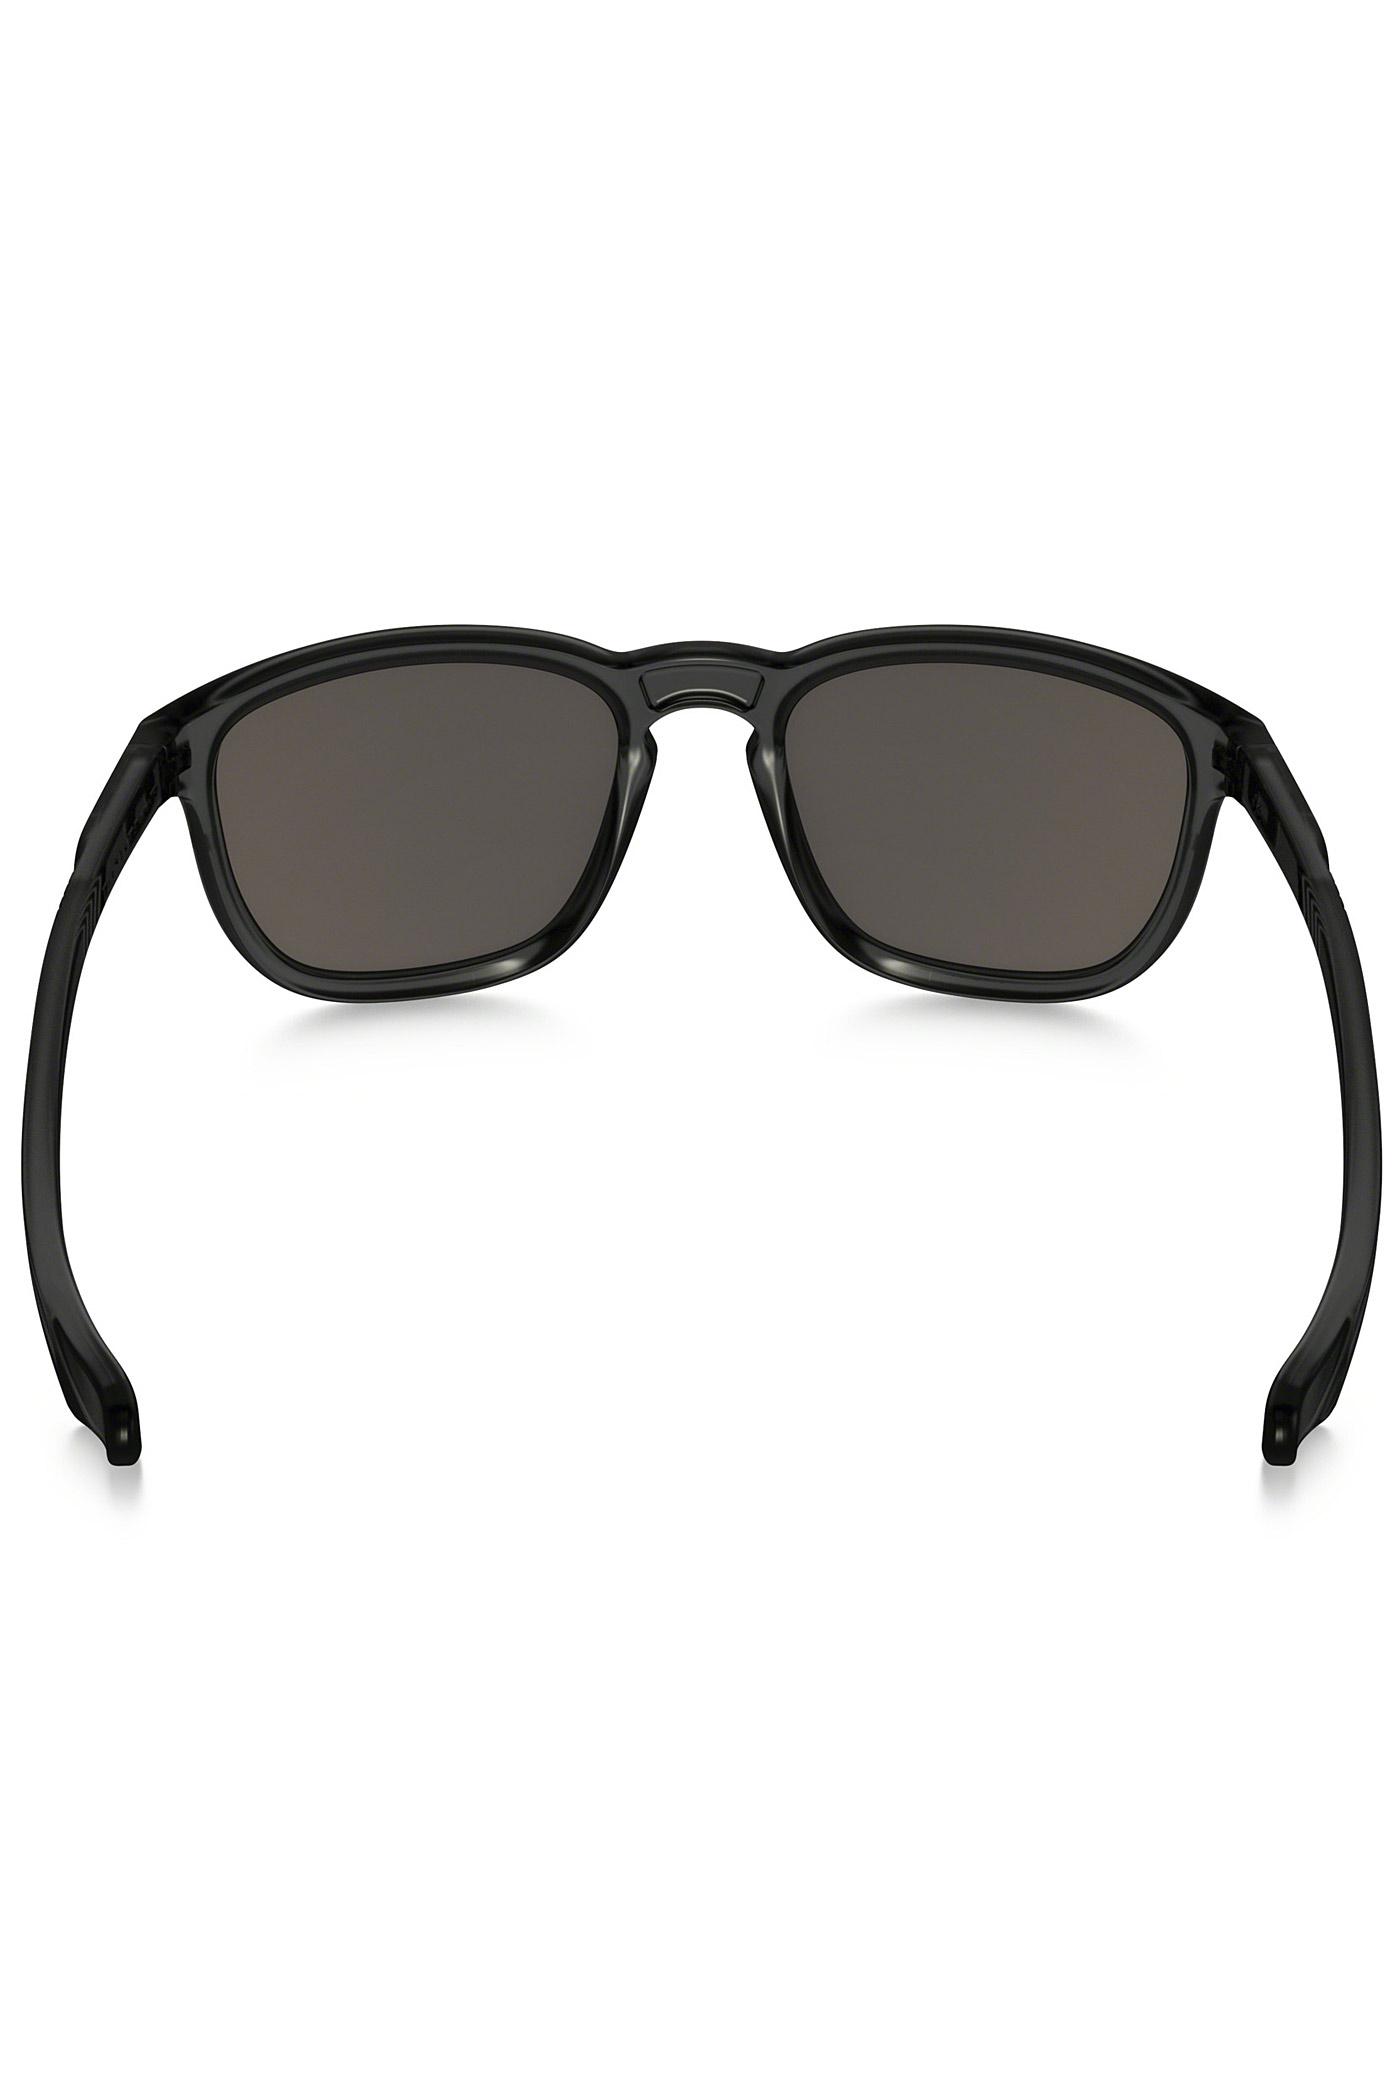 oakley free sunglasses facebook offer